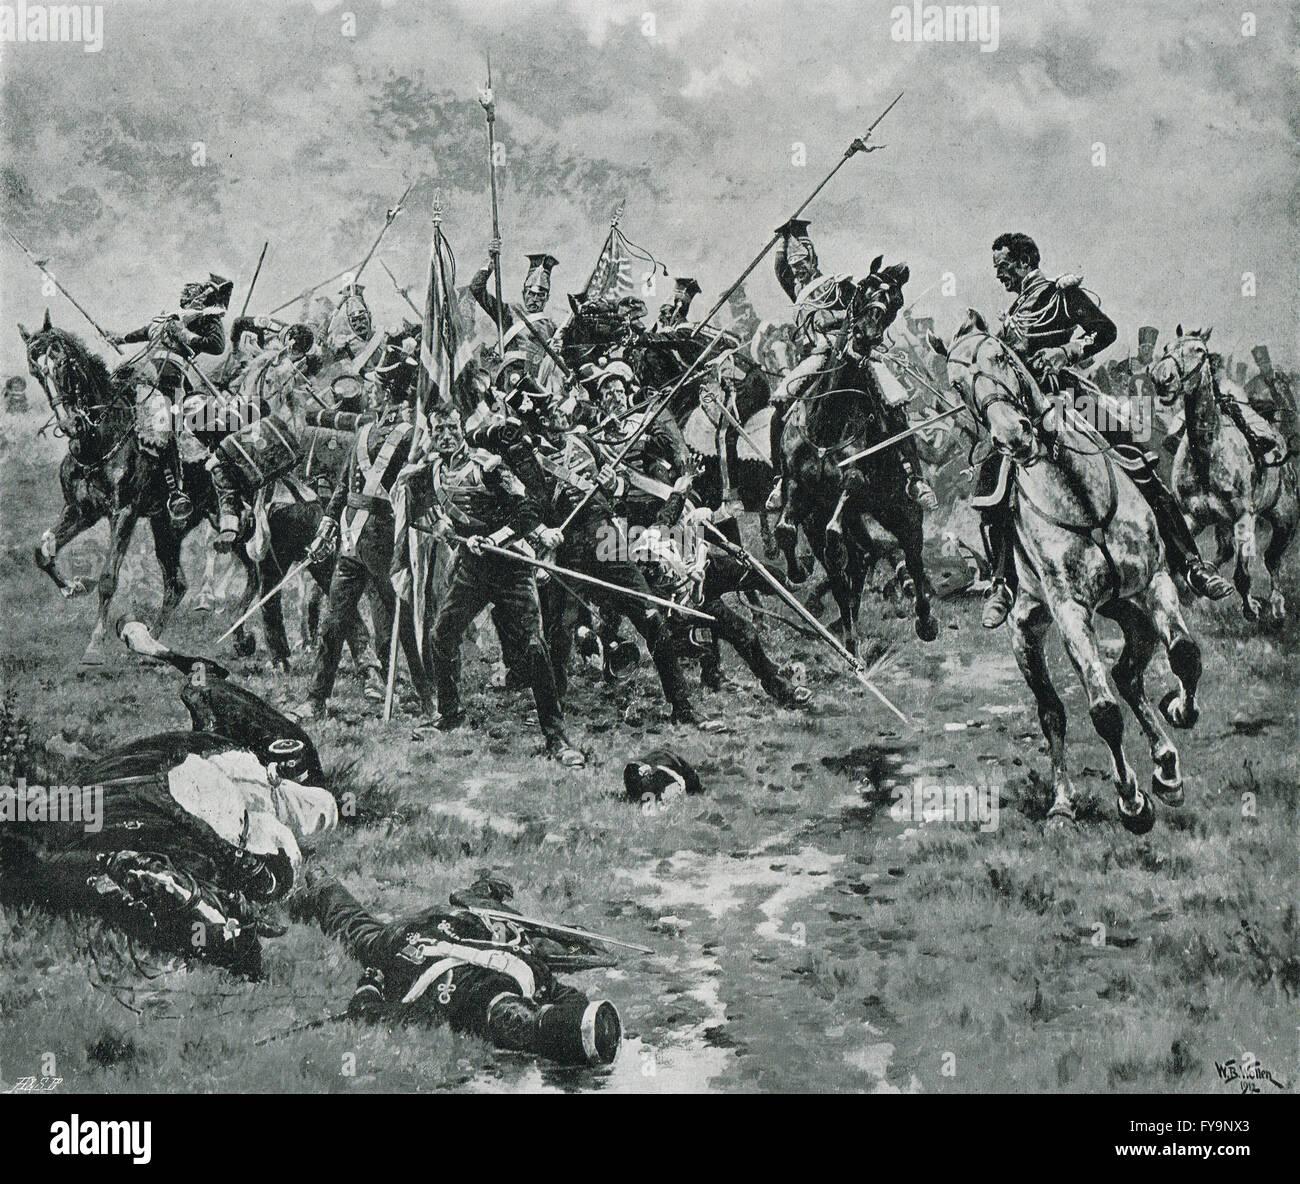 he Flag, Battle of Albuera, May 16 1811 - Stock Image